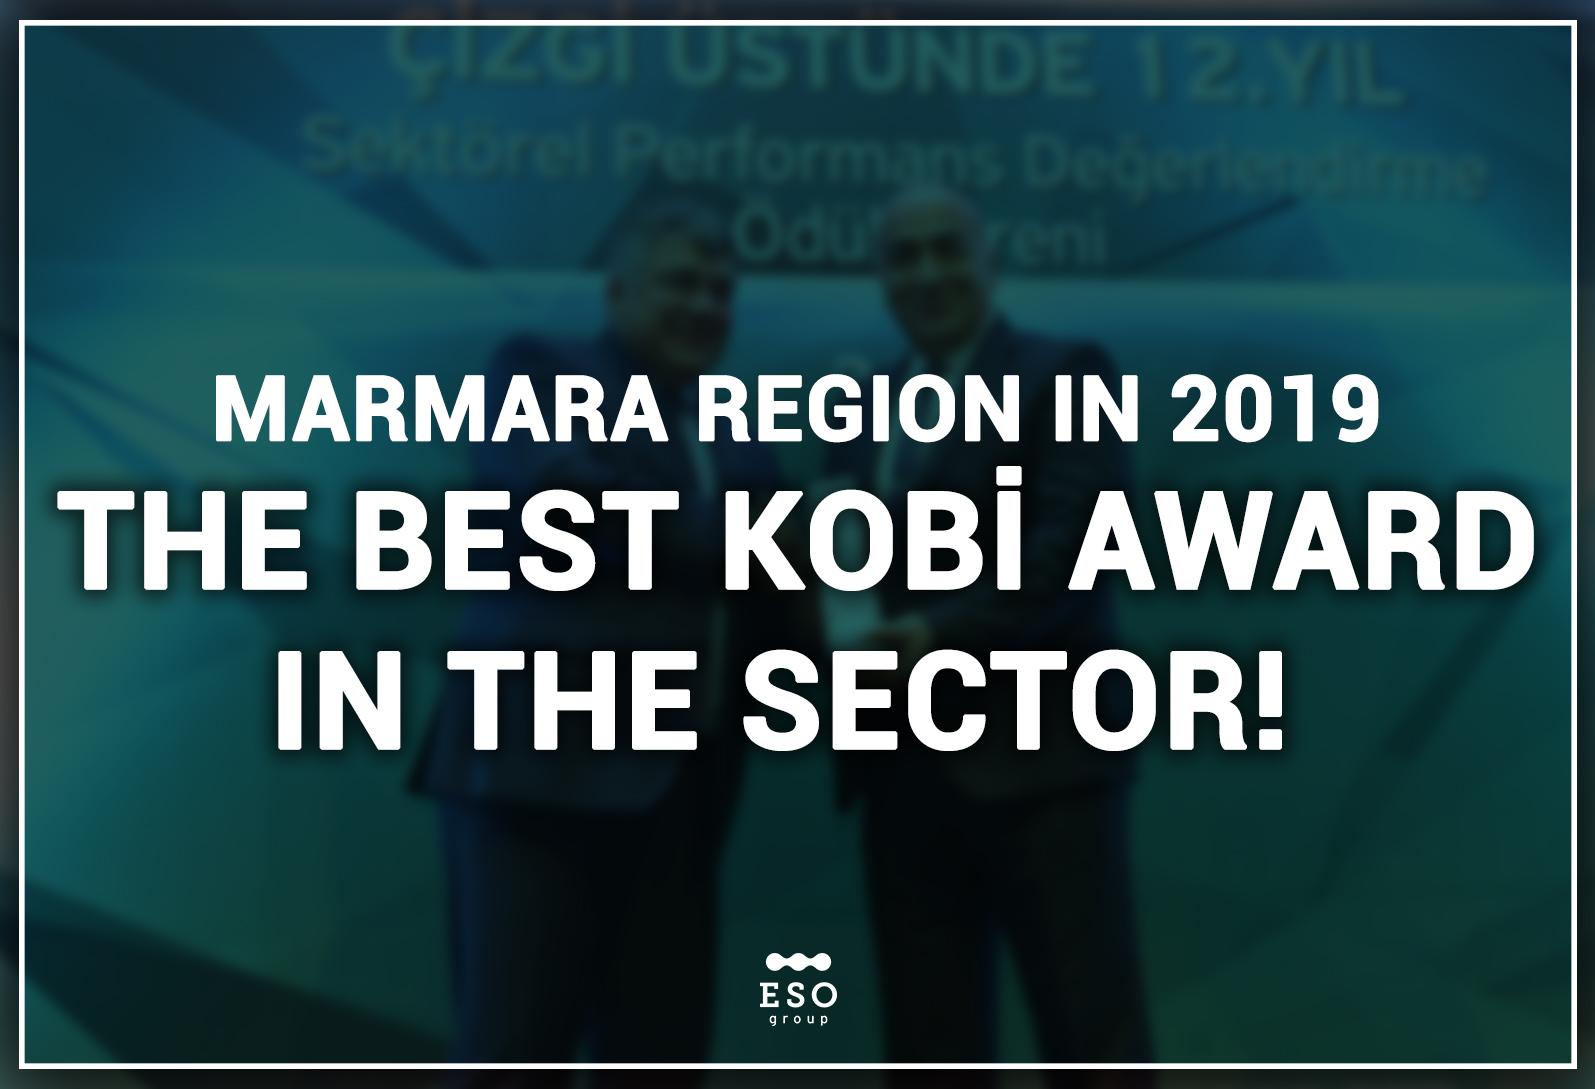 Marmara Region In 2019, The Best Kobi Award In The Sectror!